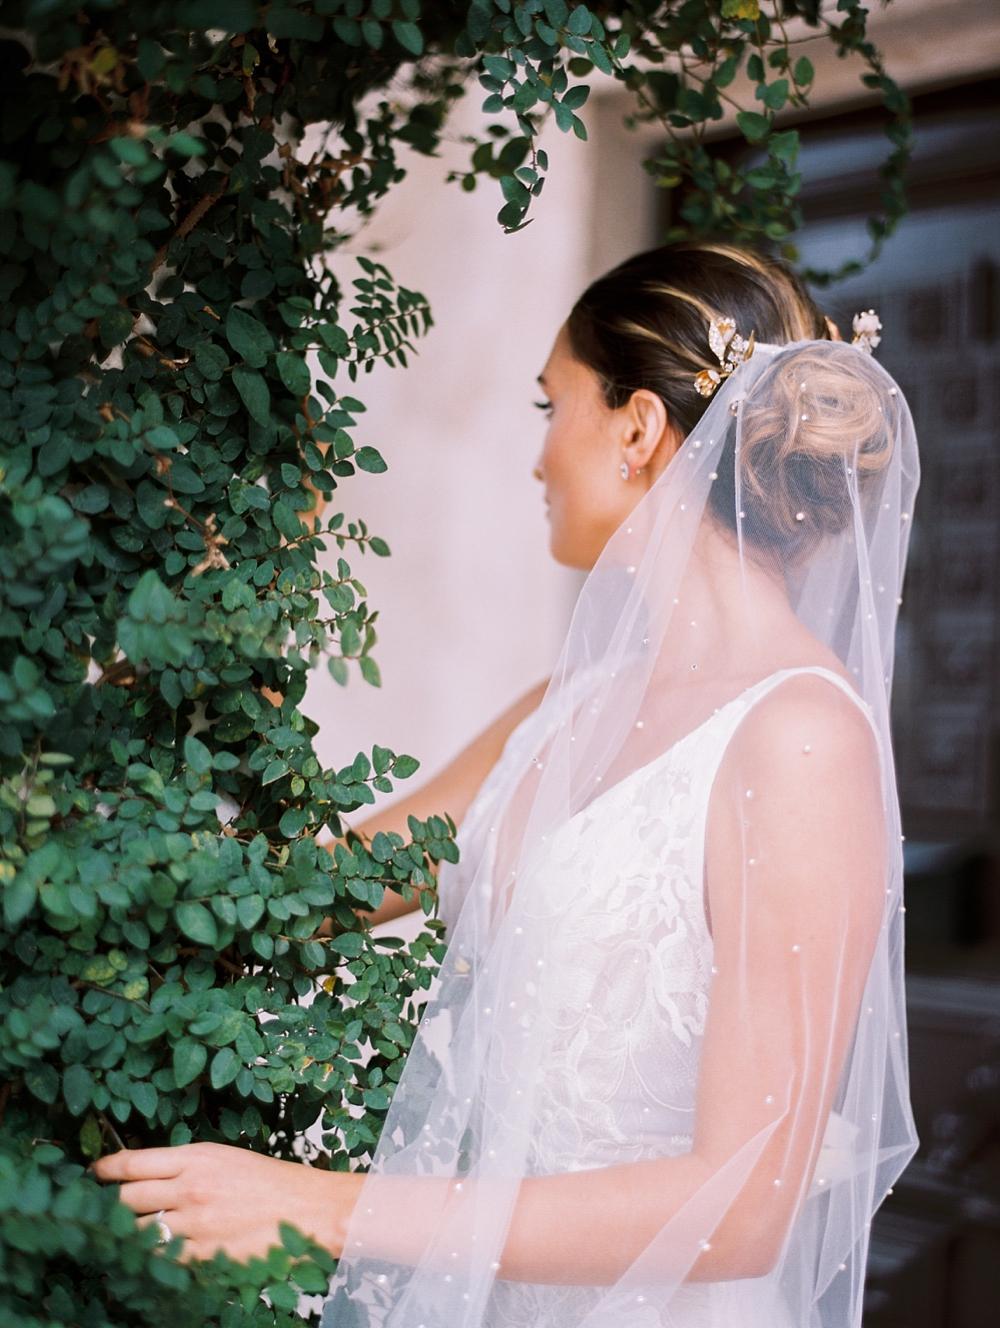 kristin-la-voie-photography-Austin-Wedding-Photographer-Villa-Antonia-174